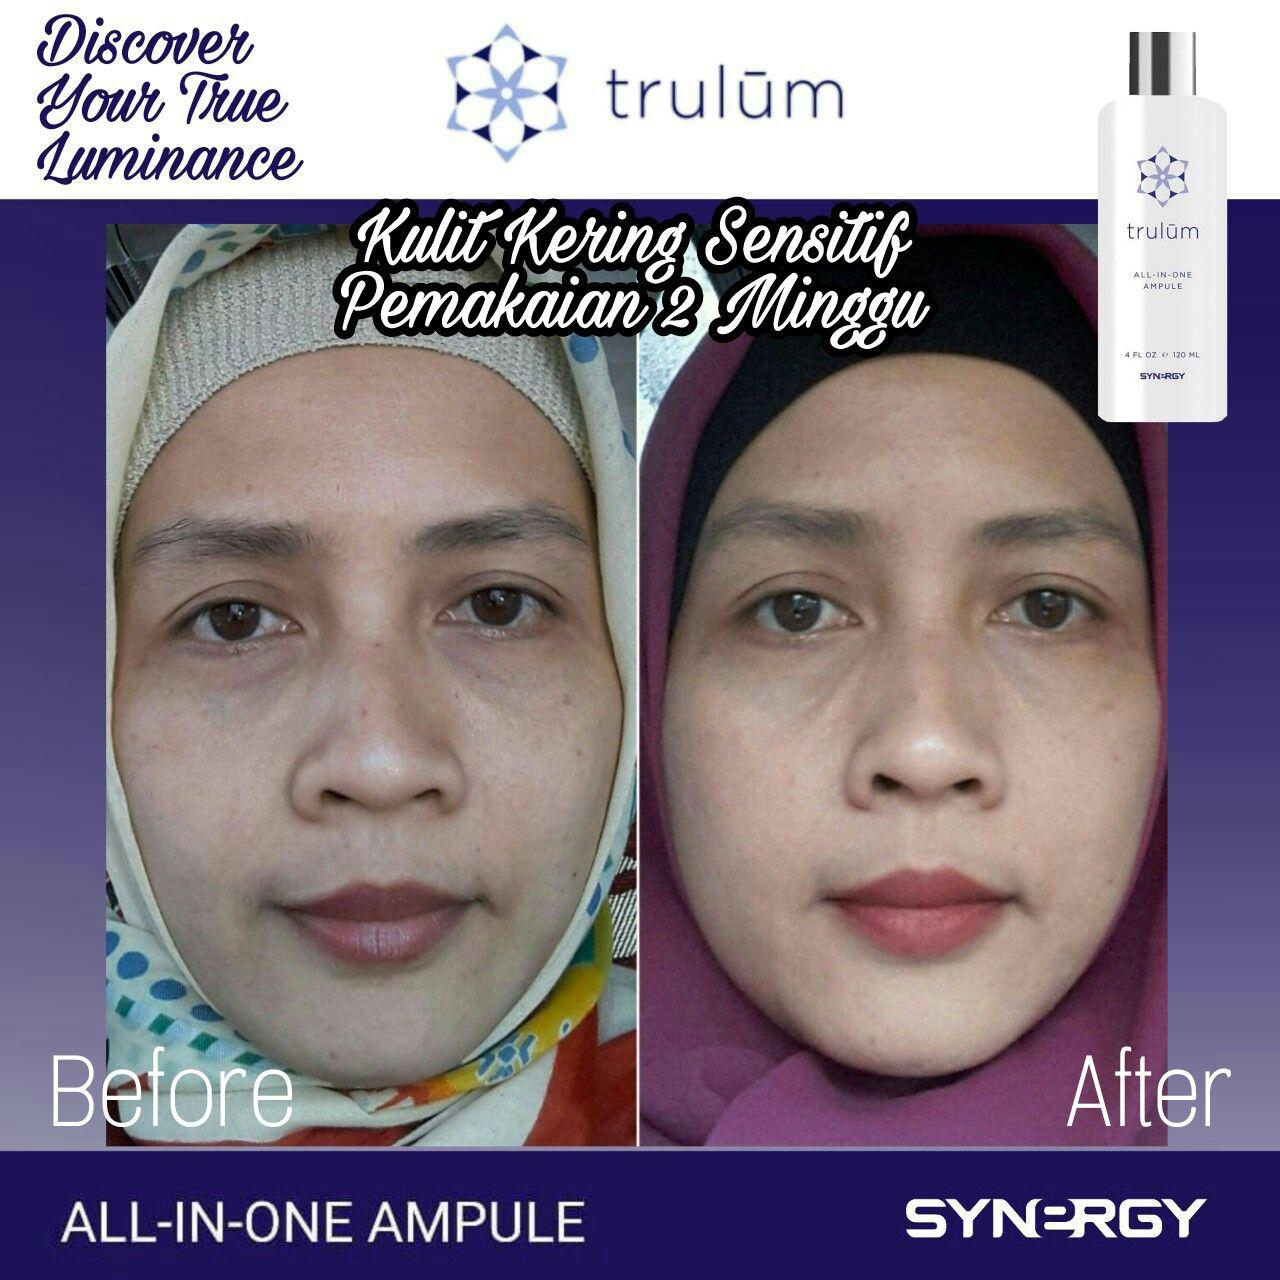 Klinik Kecantikan Trulum Skincare Di Babelankota, Bekasi WA: 08112338376